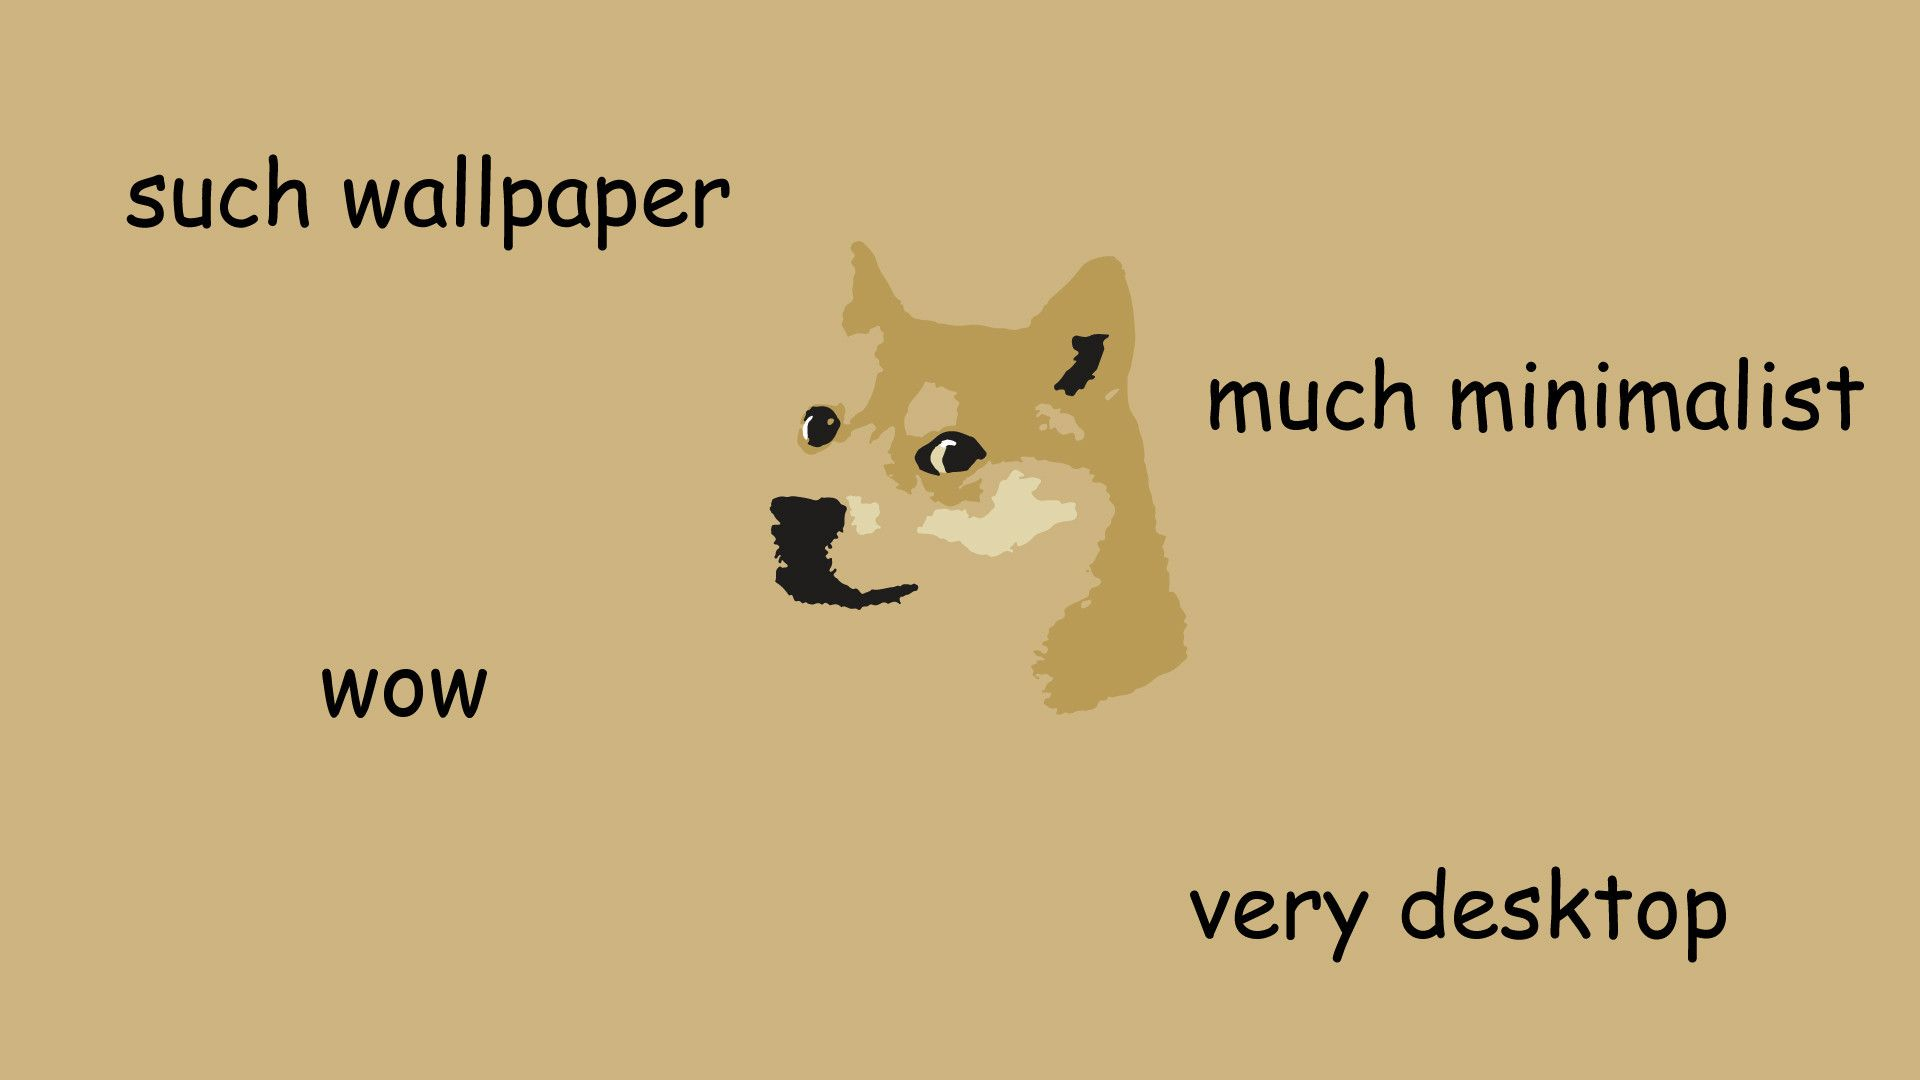 73 Dank Meme Wallpapers On Wallpaperplay Laptop Wallpaper Desktop Wallpapers Vintage Desktop Wallpapers Cute Desktop Wallpaper